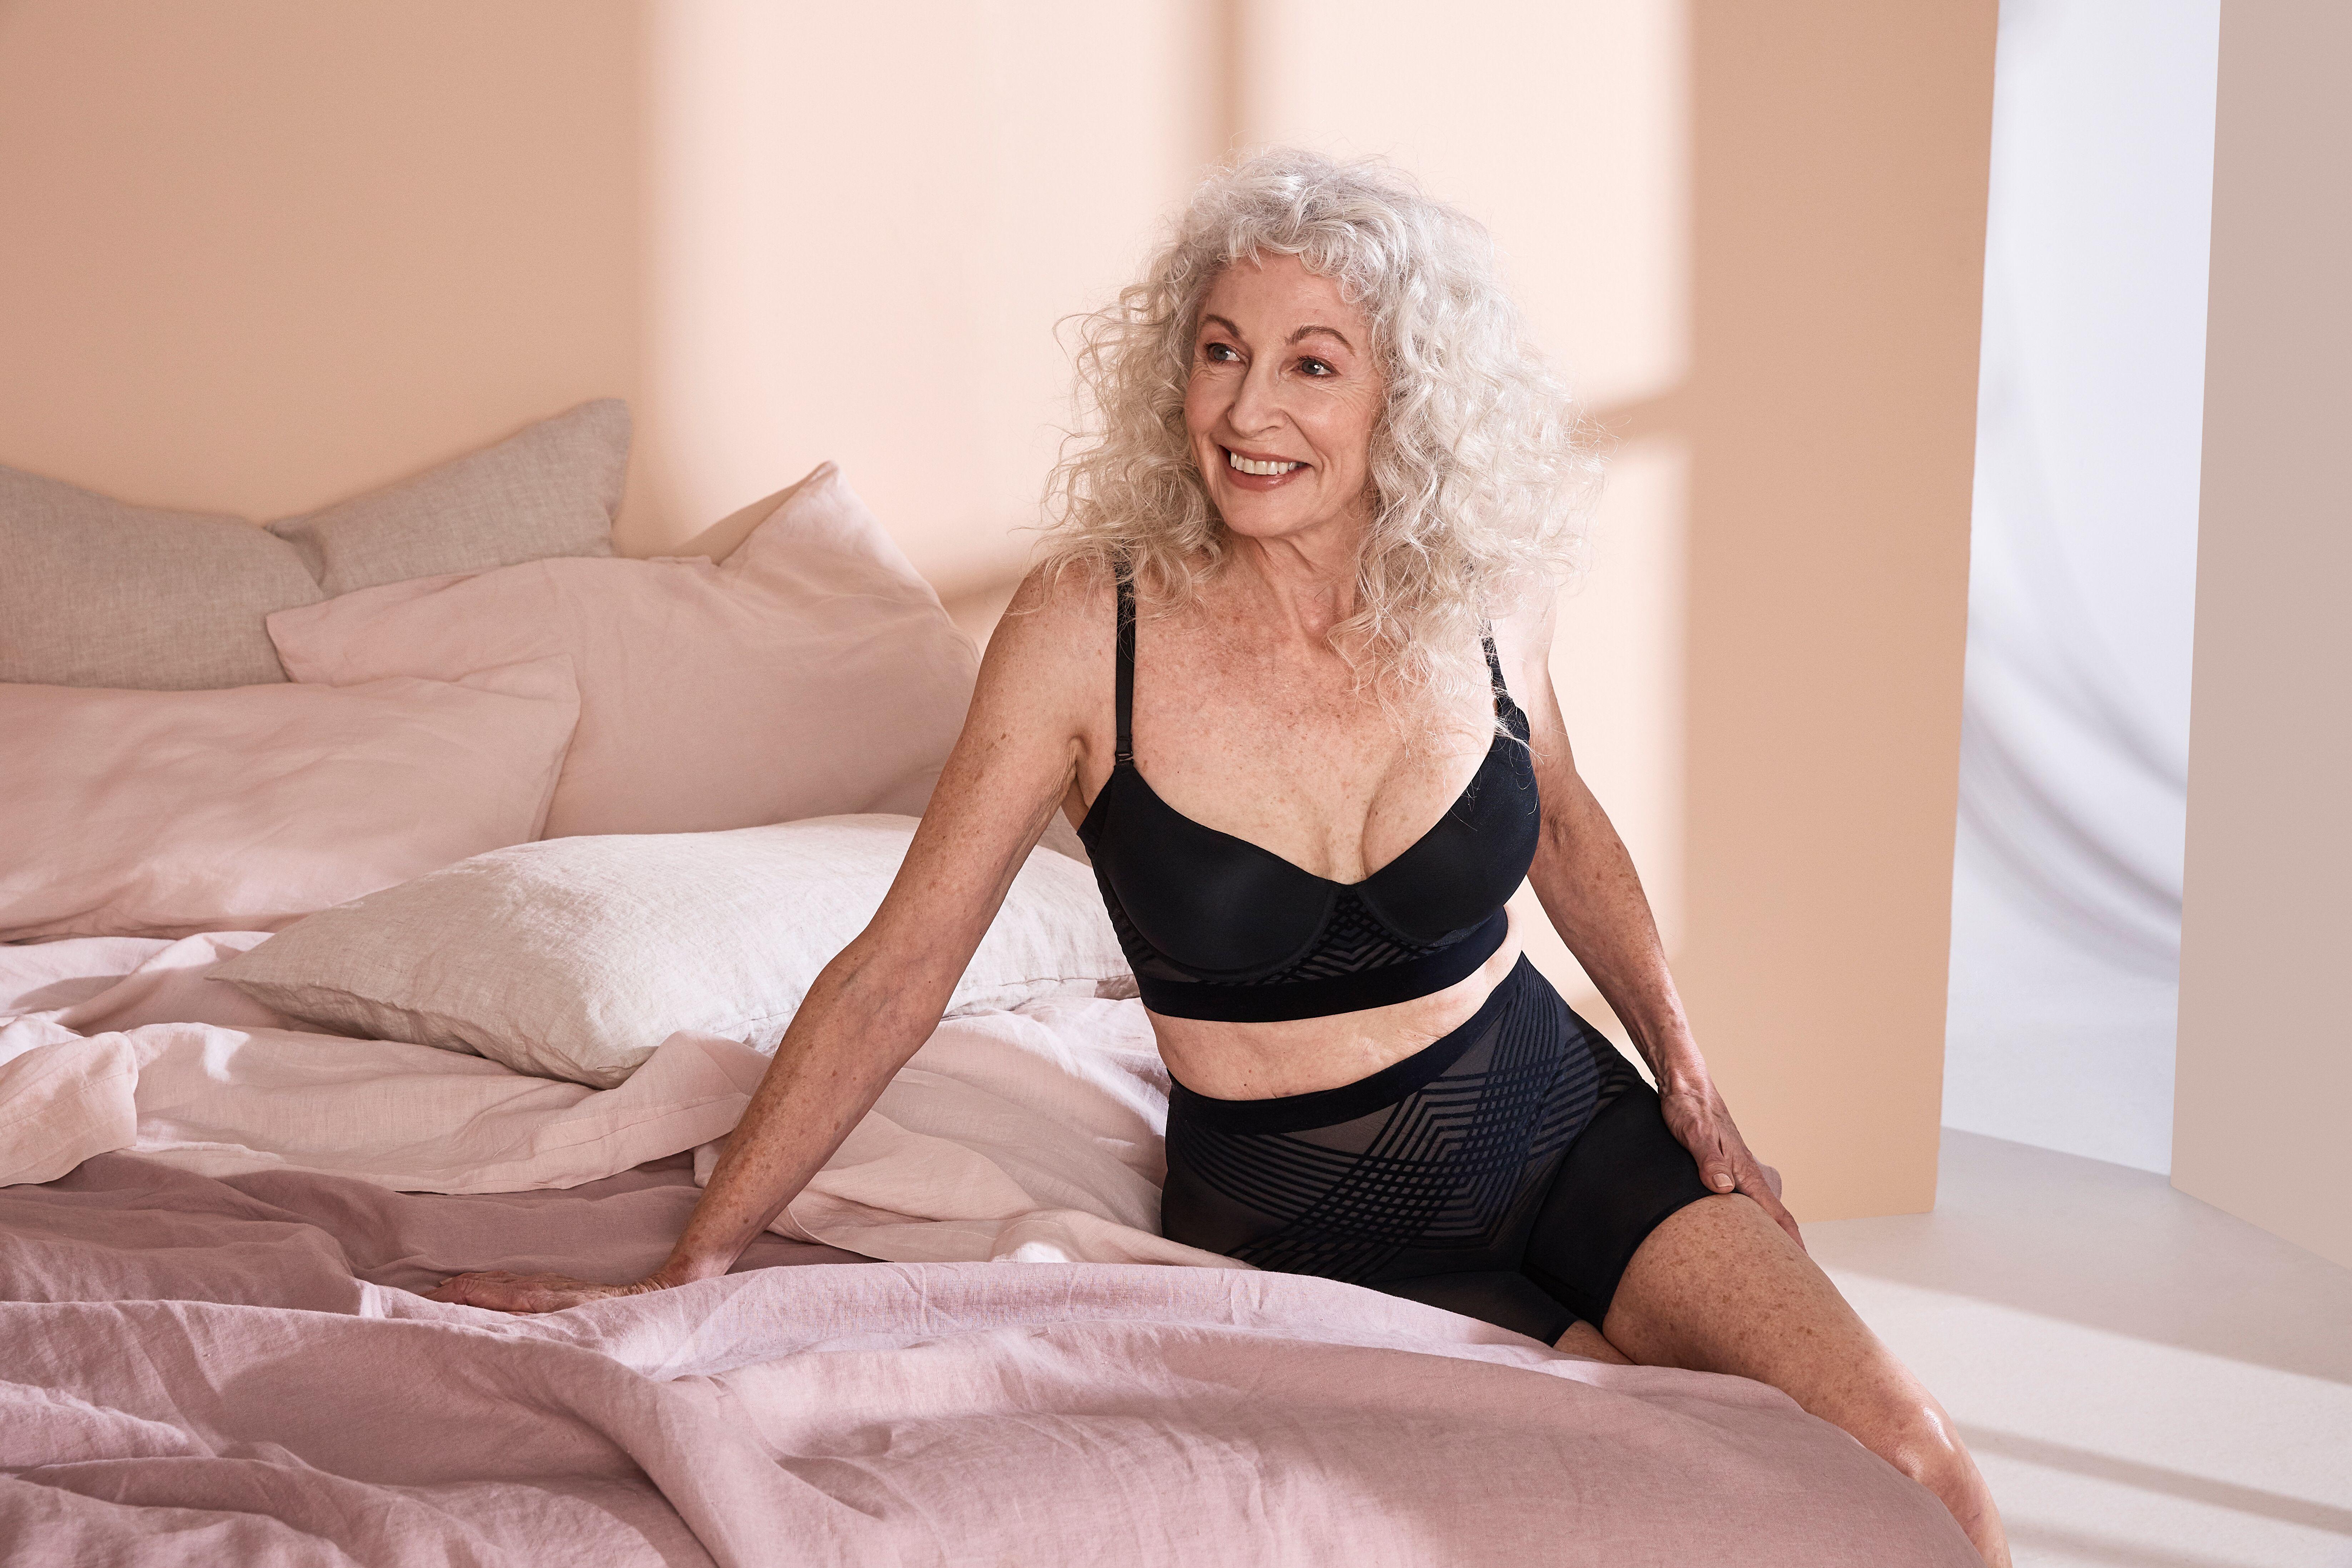 Australian shapewear brand Nancy Ganz launches 'All Kinds of Beautiful' campaign